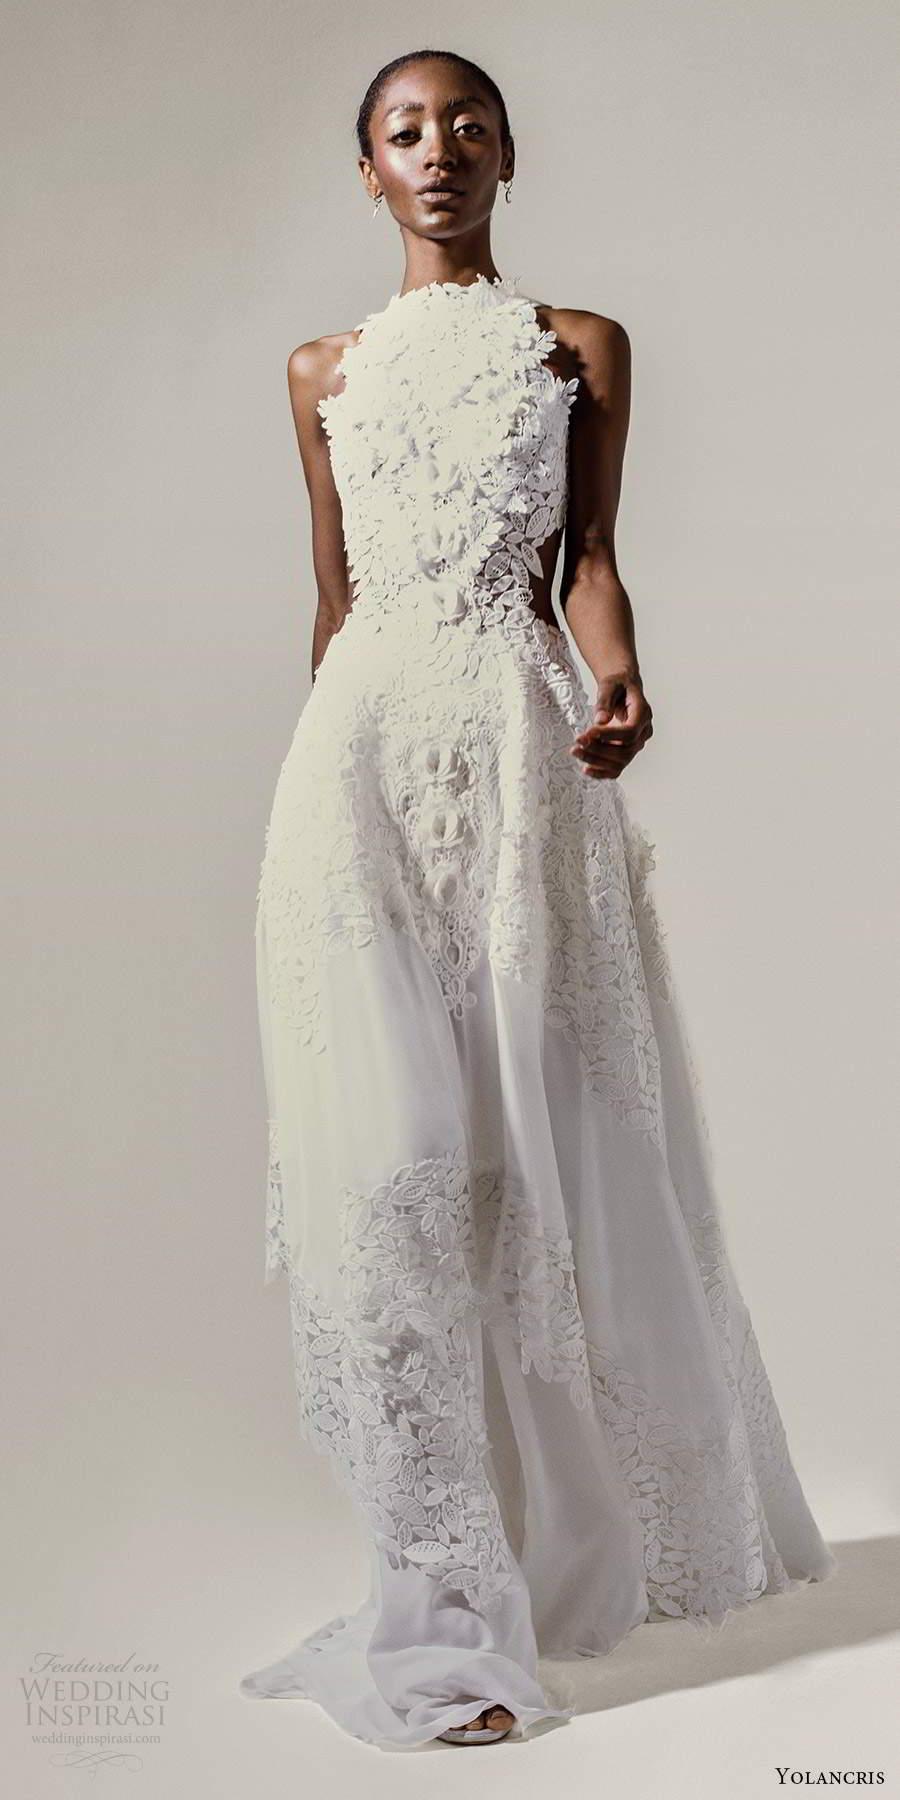 yolancris 2021 bridal sleeveless halter neckline fully embellished a line ball gown wedding dress (6) mv